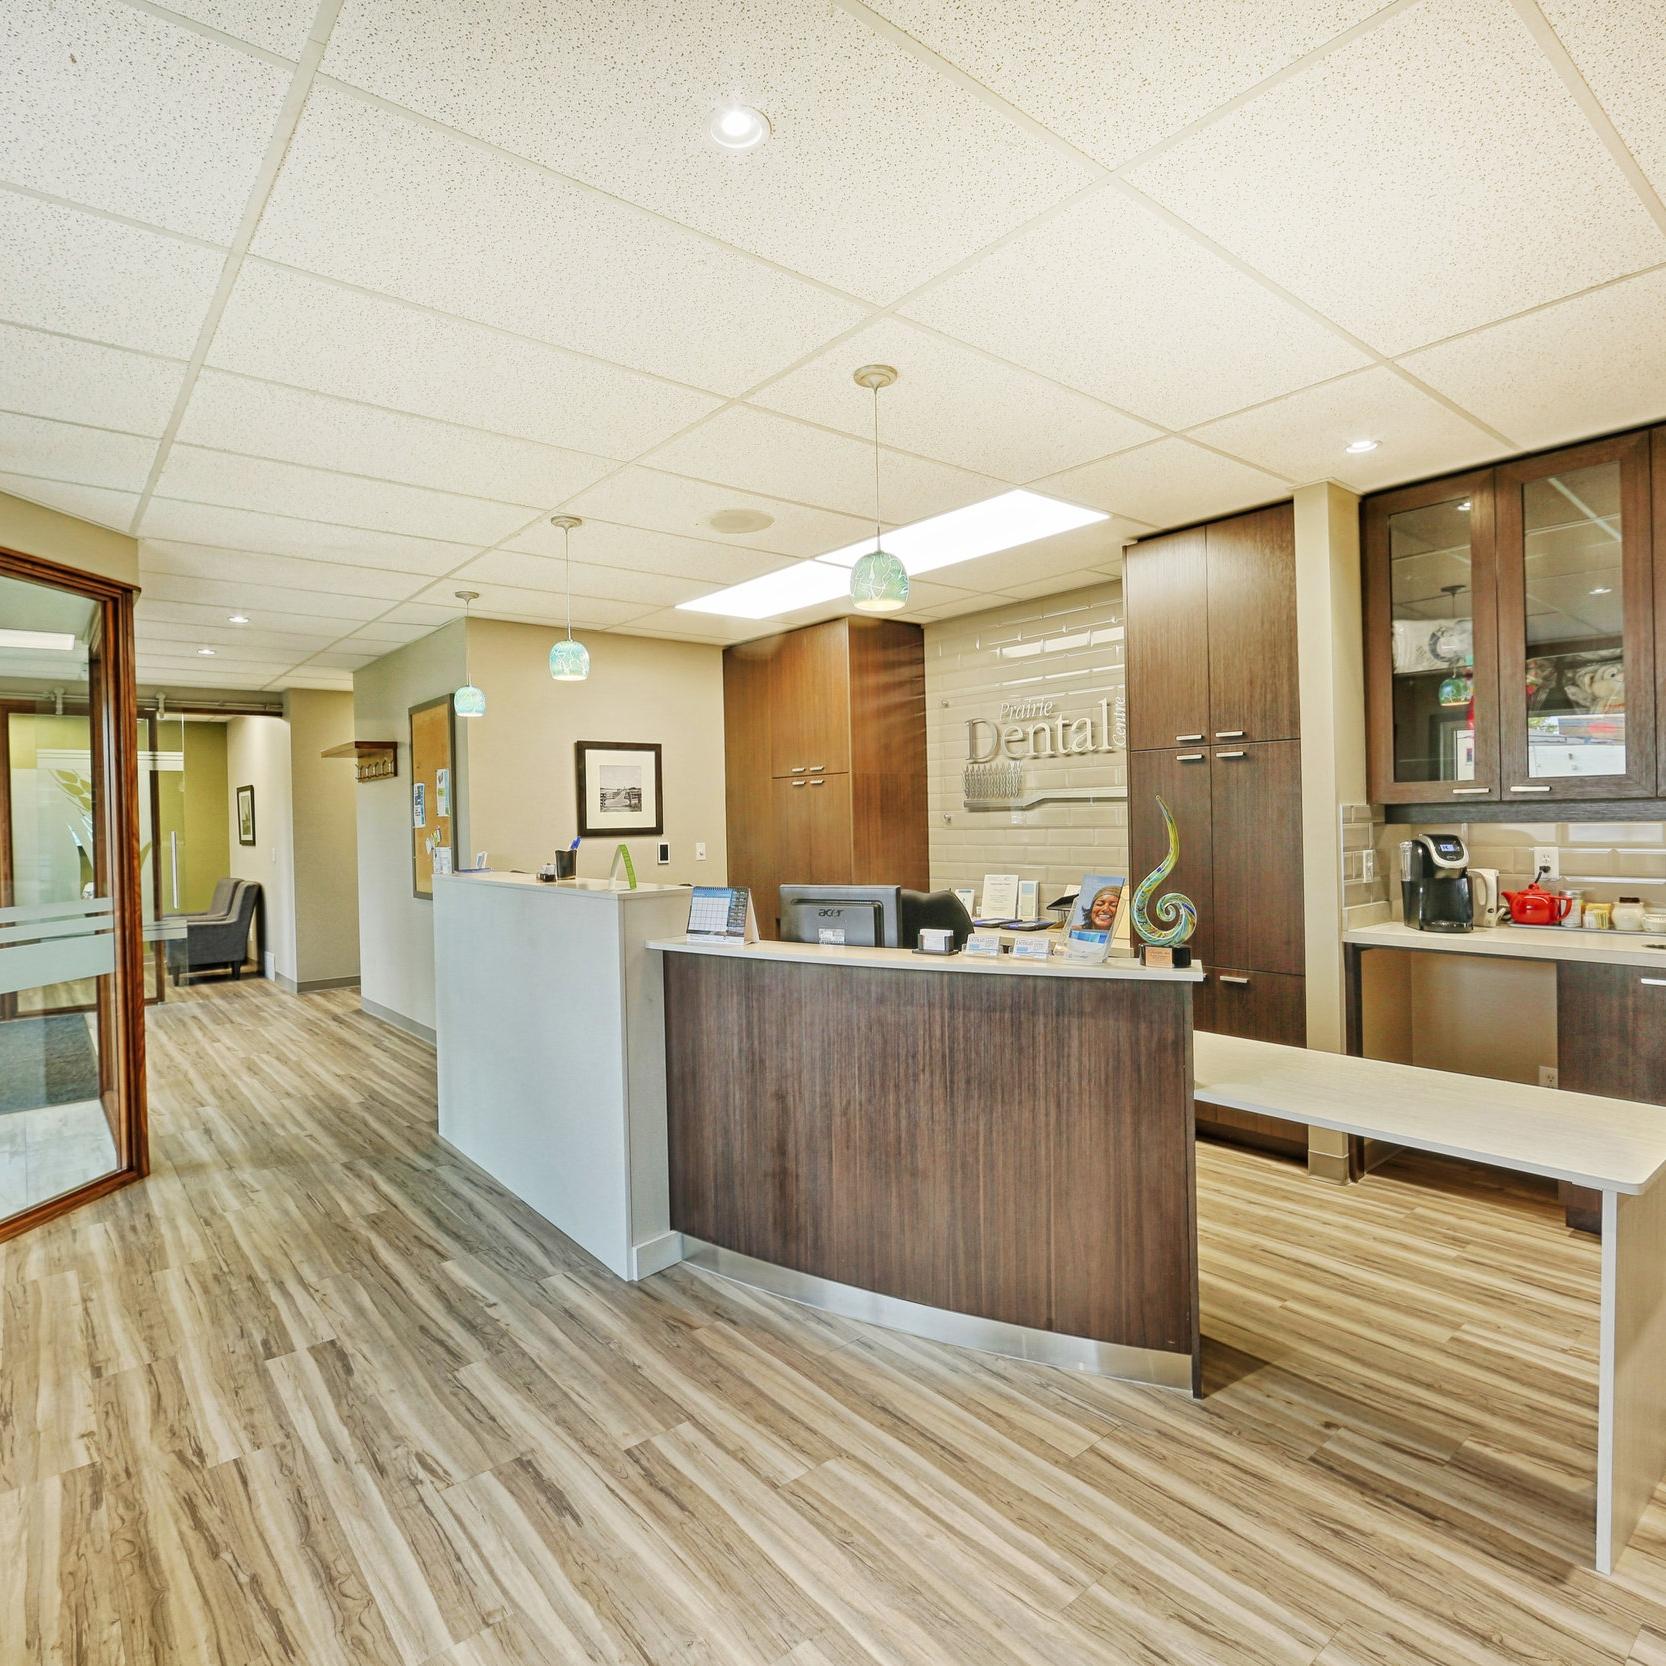 Leduc Dentist Prairie Dental Reception 3.jpg